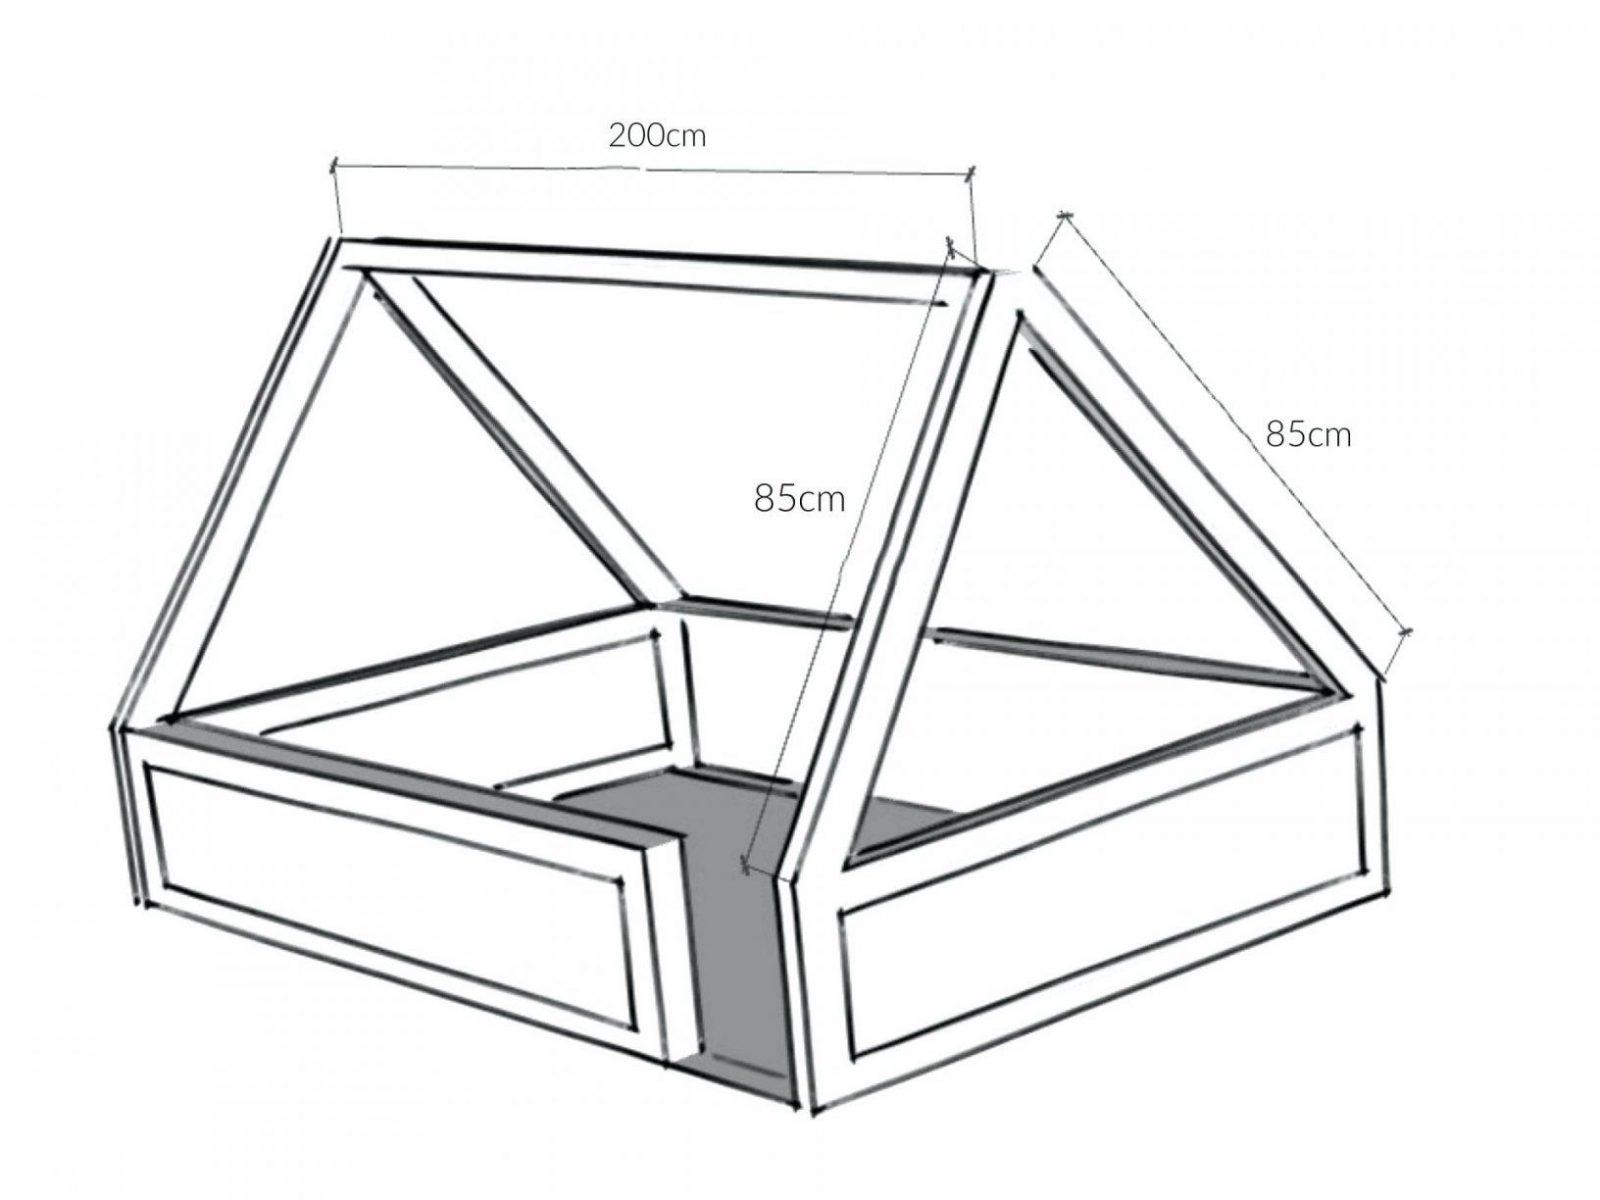 Bauanleitung Hochbett Ikea Kura Haus Stora Anleitung Selbst Bauen von Bauanleitung Hochbett Mit Rutsche Bild